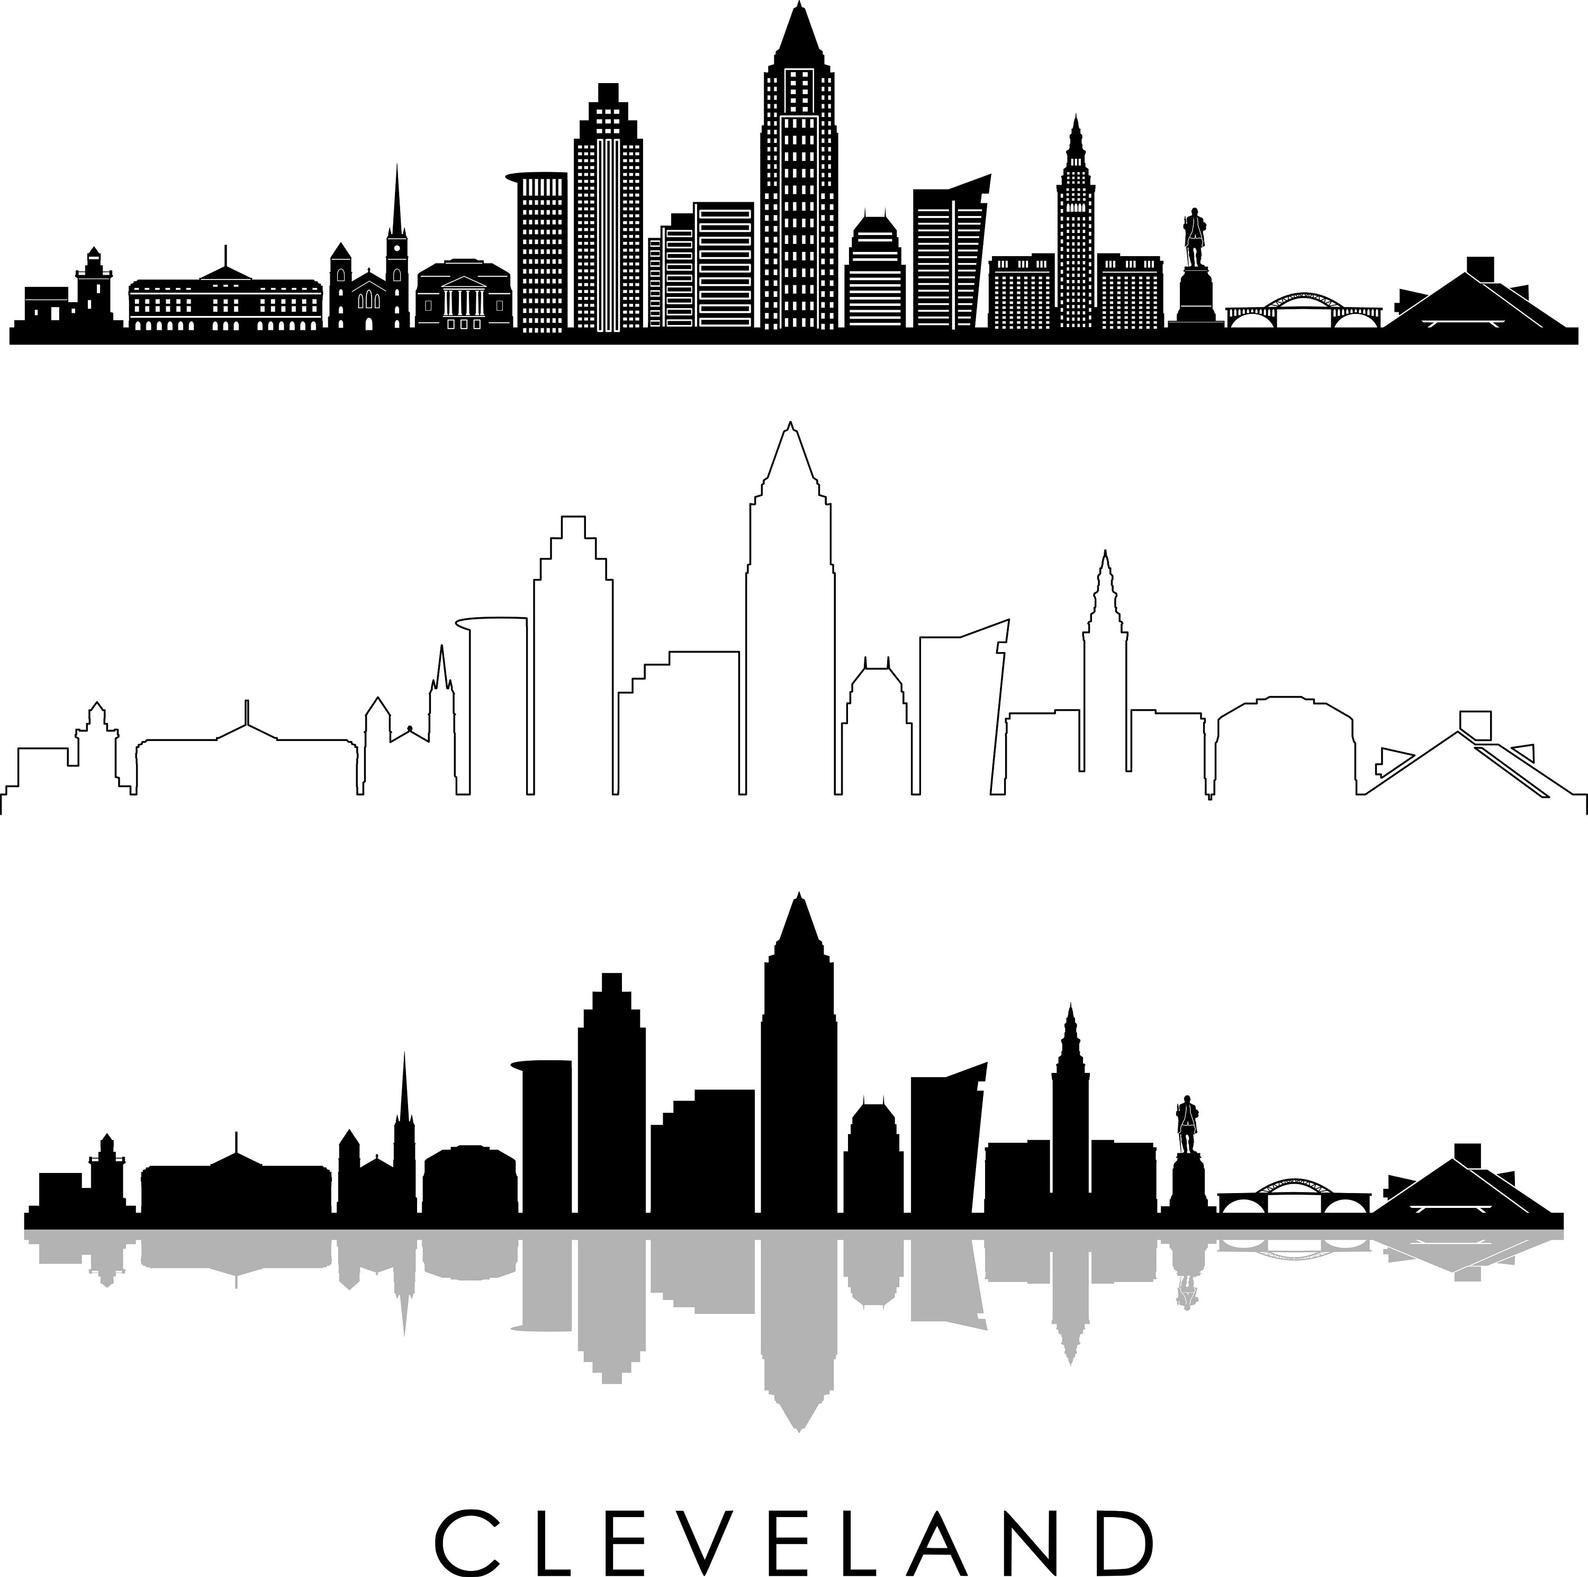 Cleveland Skyline Outline Silhouette Vector Svg Eps Jpg Png Etsy City Skyline Silhouette Cleveland Skyline Boston Skyline Silhouette